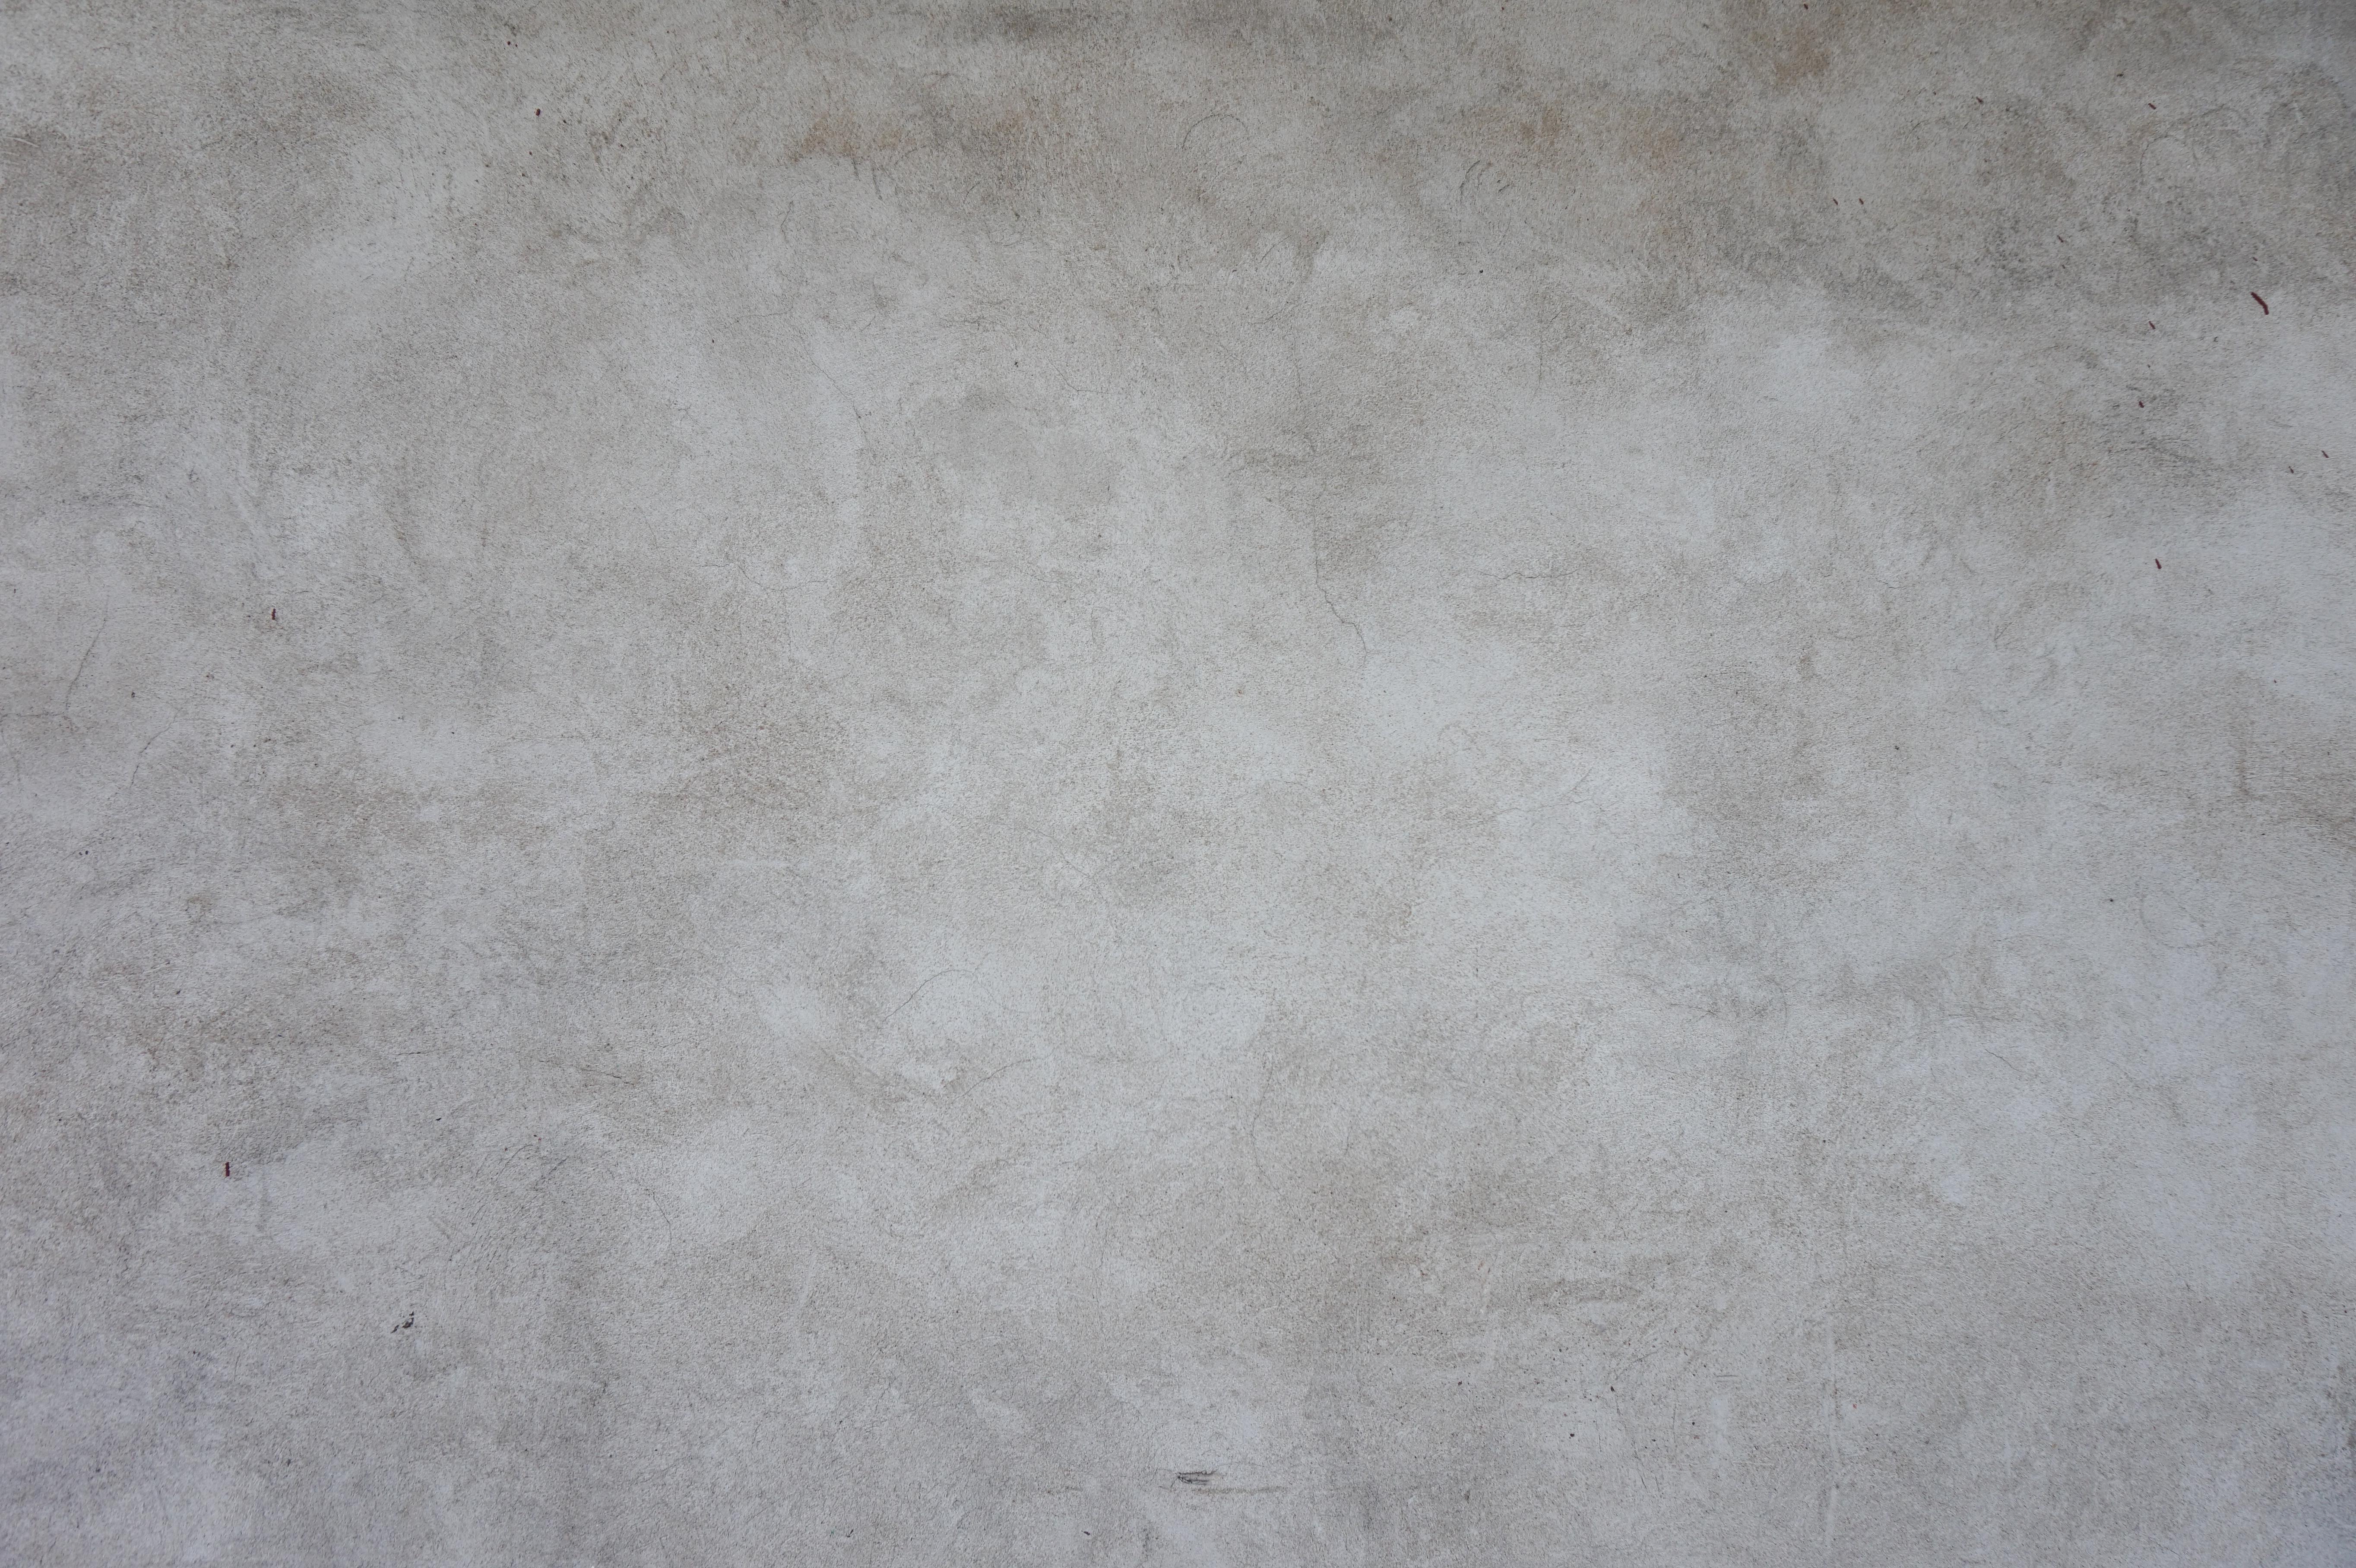 Plain Concrete Wall Concrete Texturify Free Textures